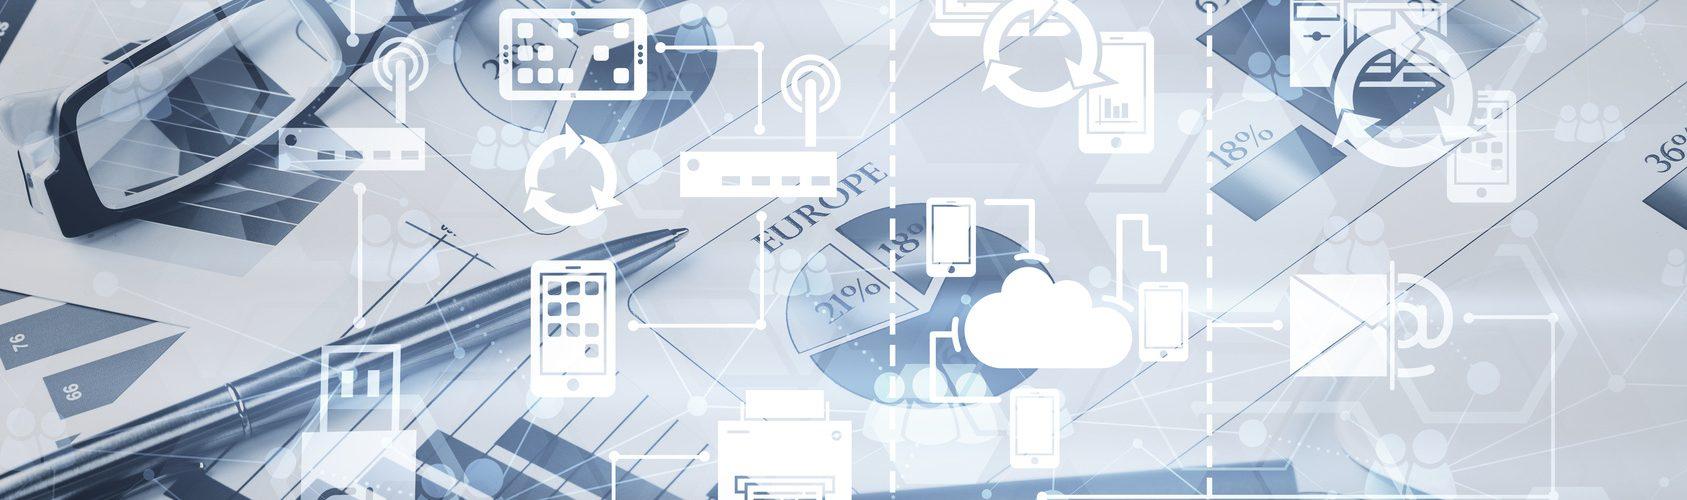 Implémentation Digital Workplace